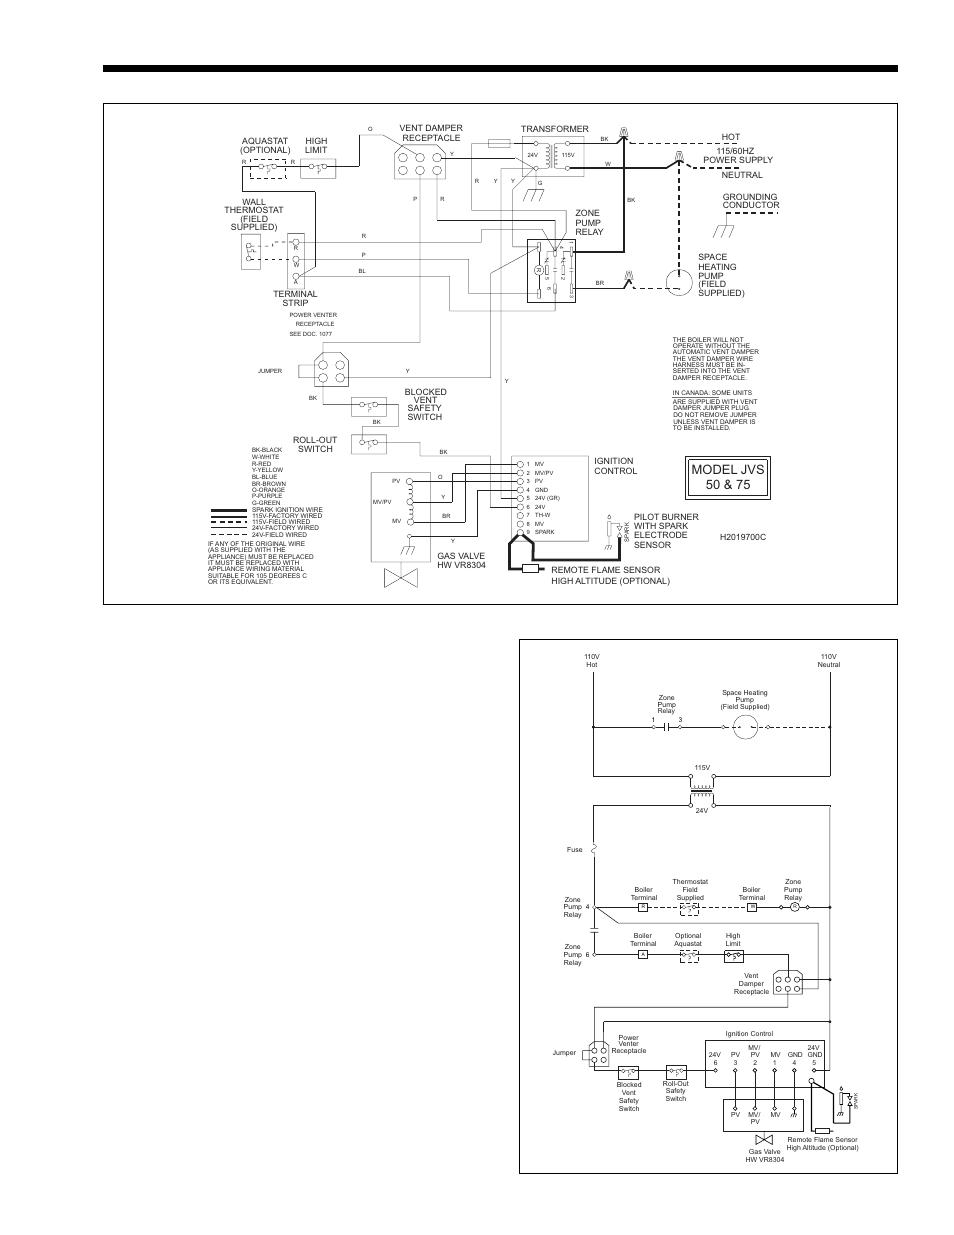 Wiring Diagram For Lifan 125cc Photo Album - Wiring diagram schematic